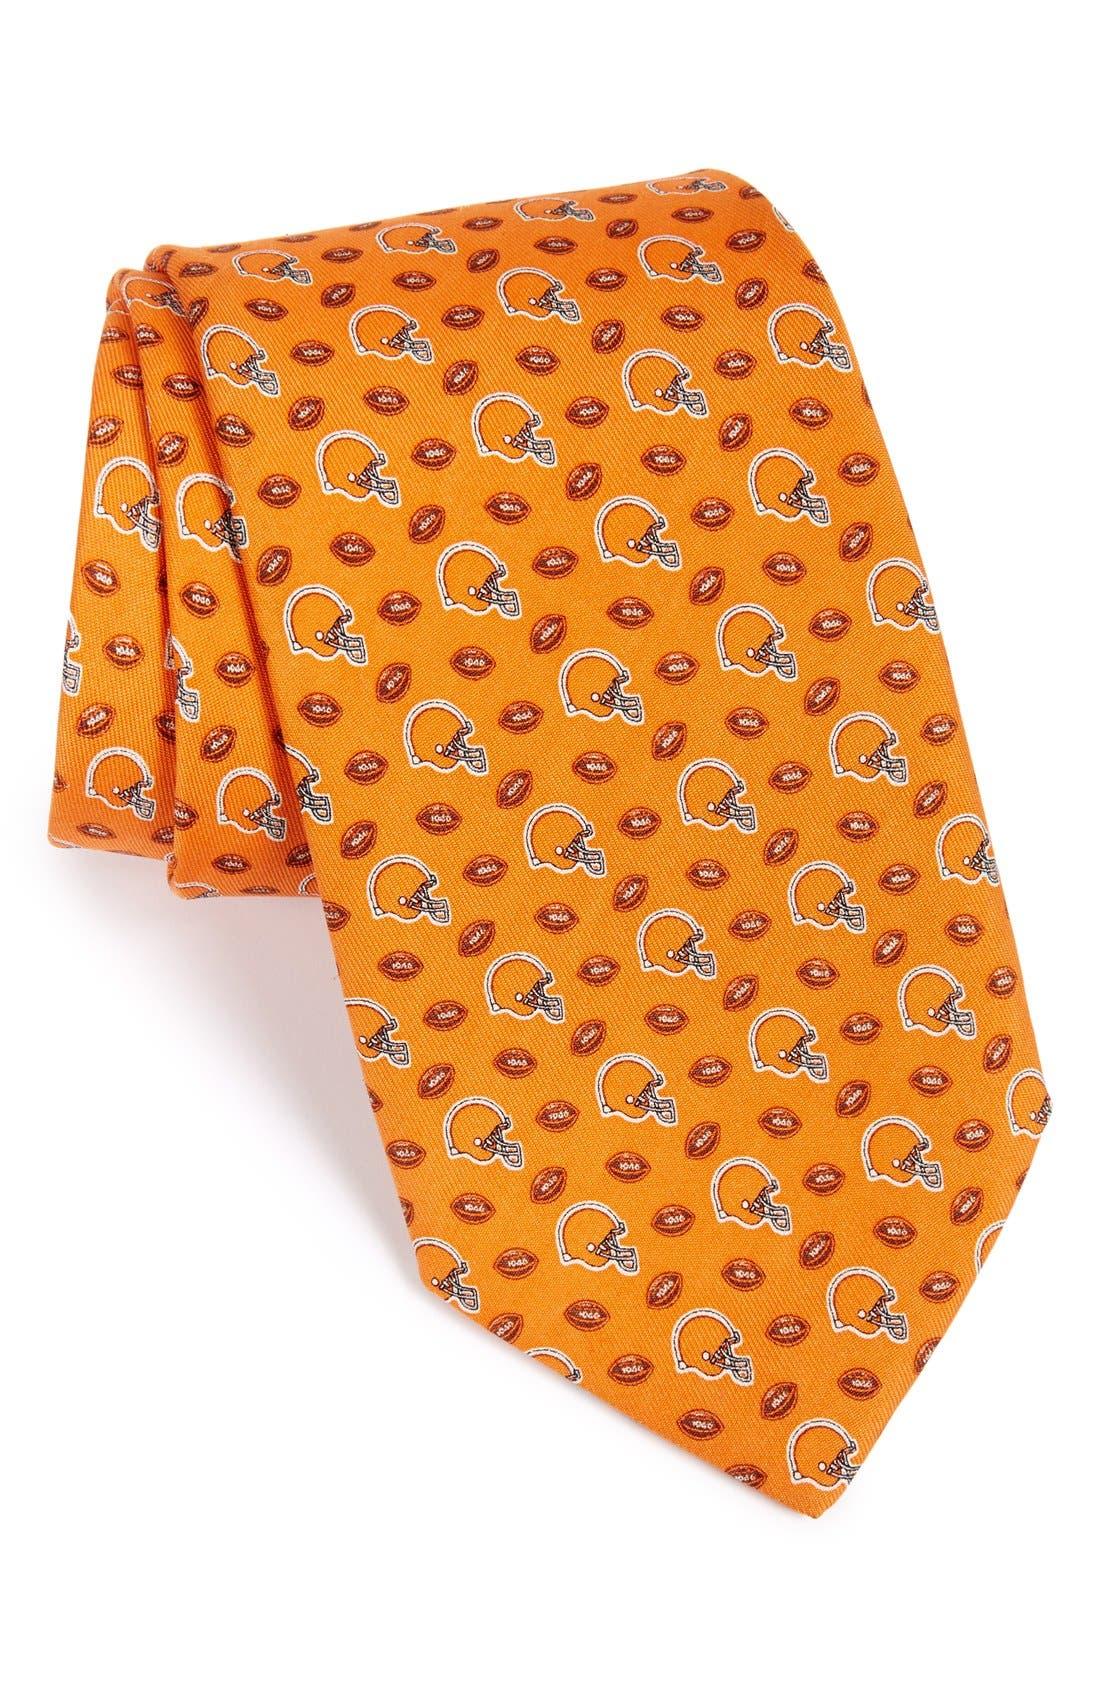 Cleveland Browns - NFL Woven Silk Tie,                         Main,                         color, Orange